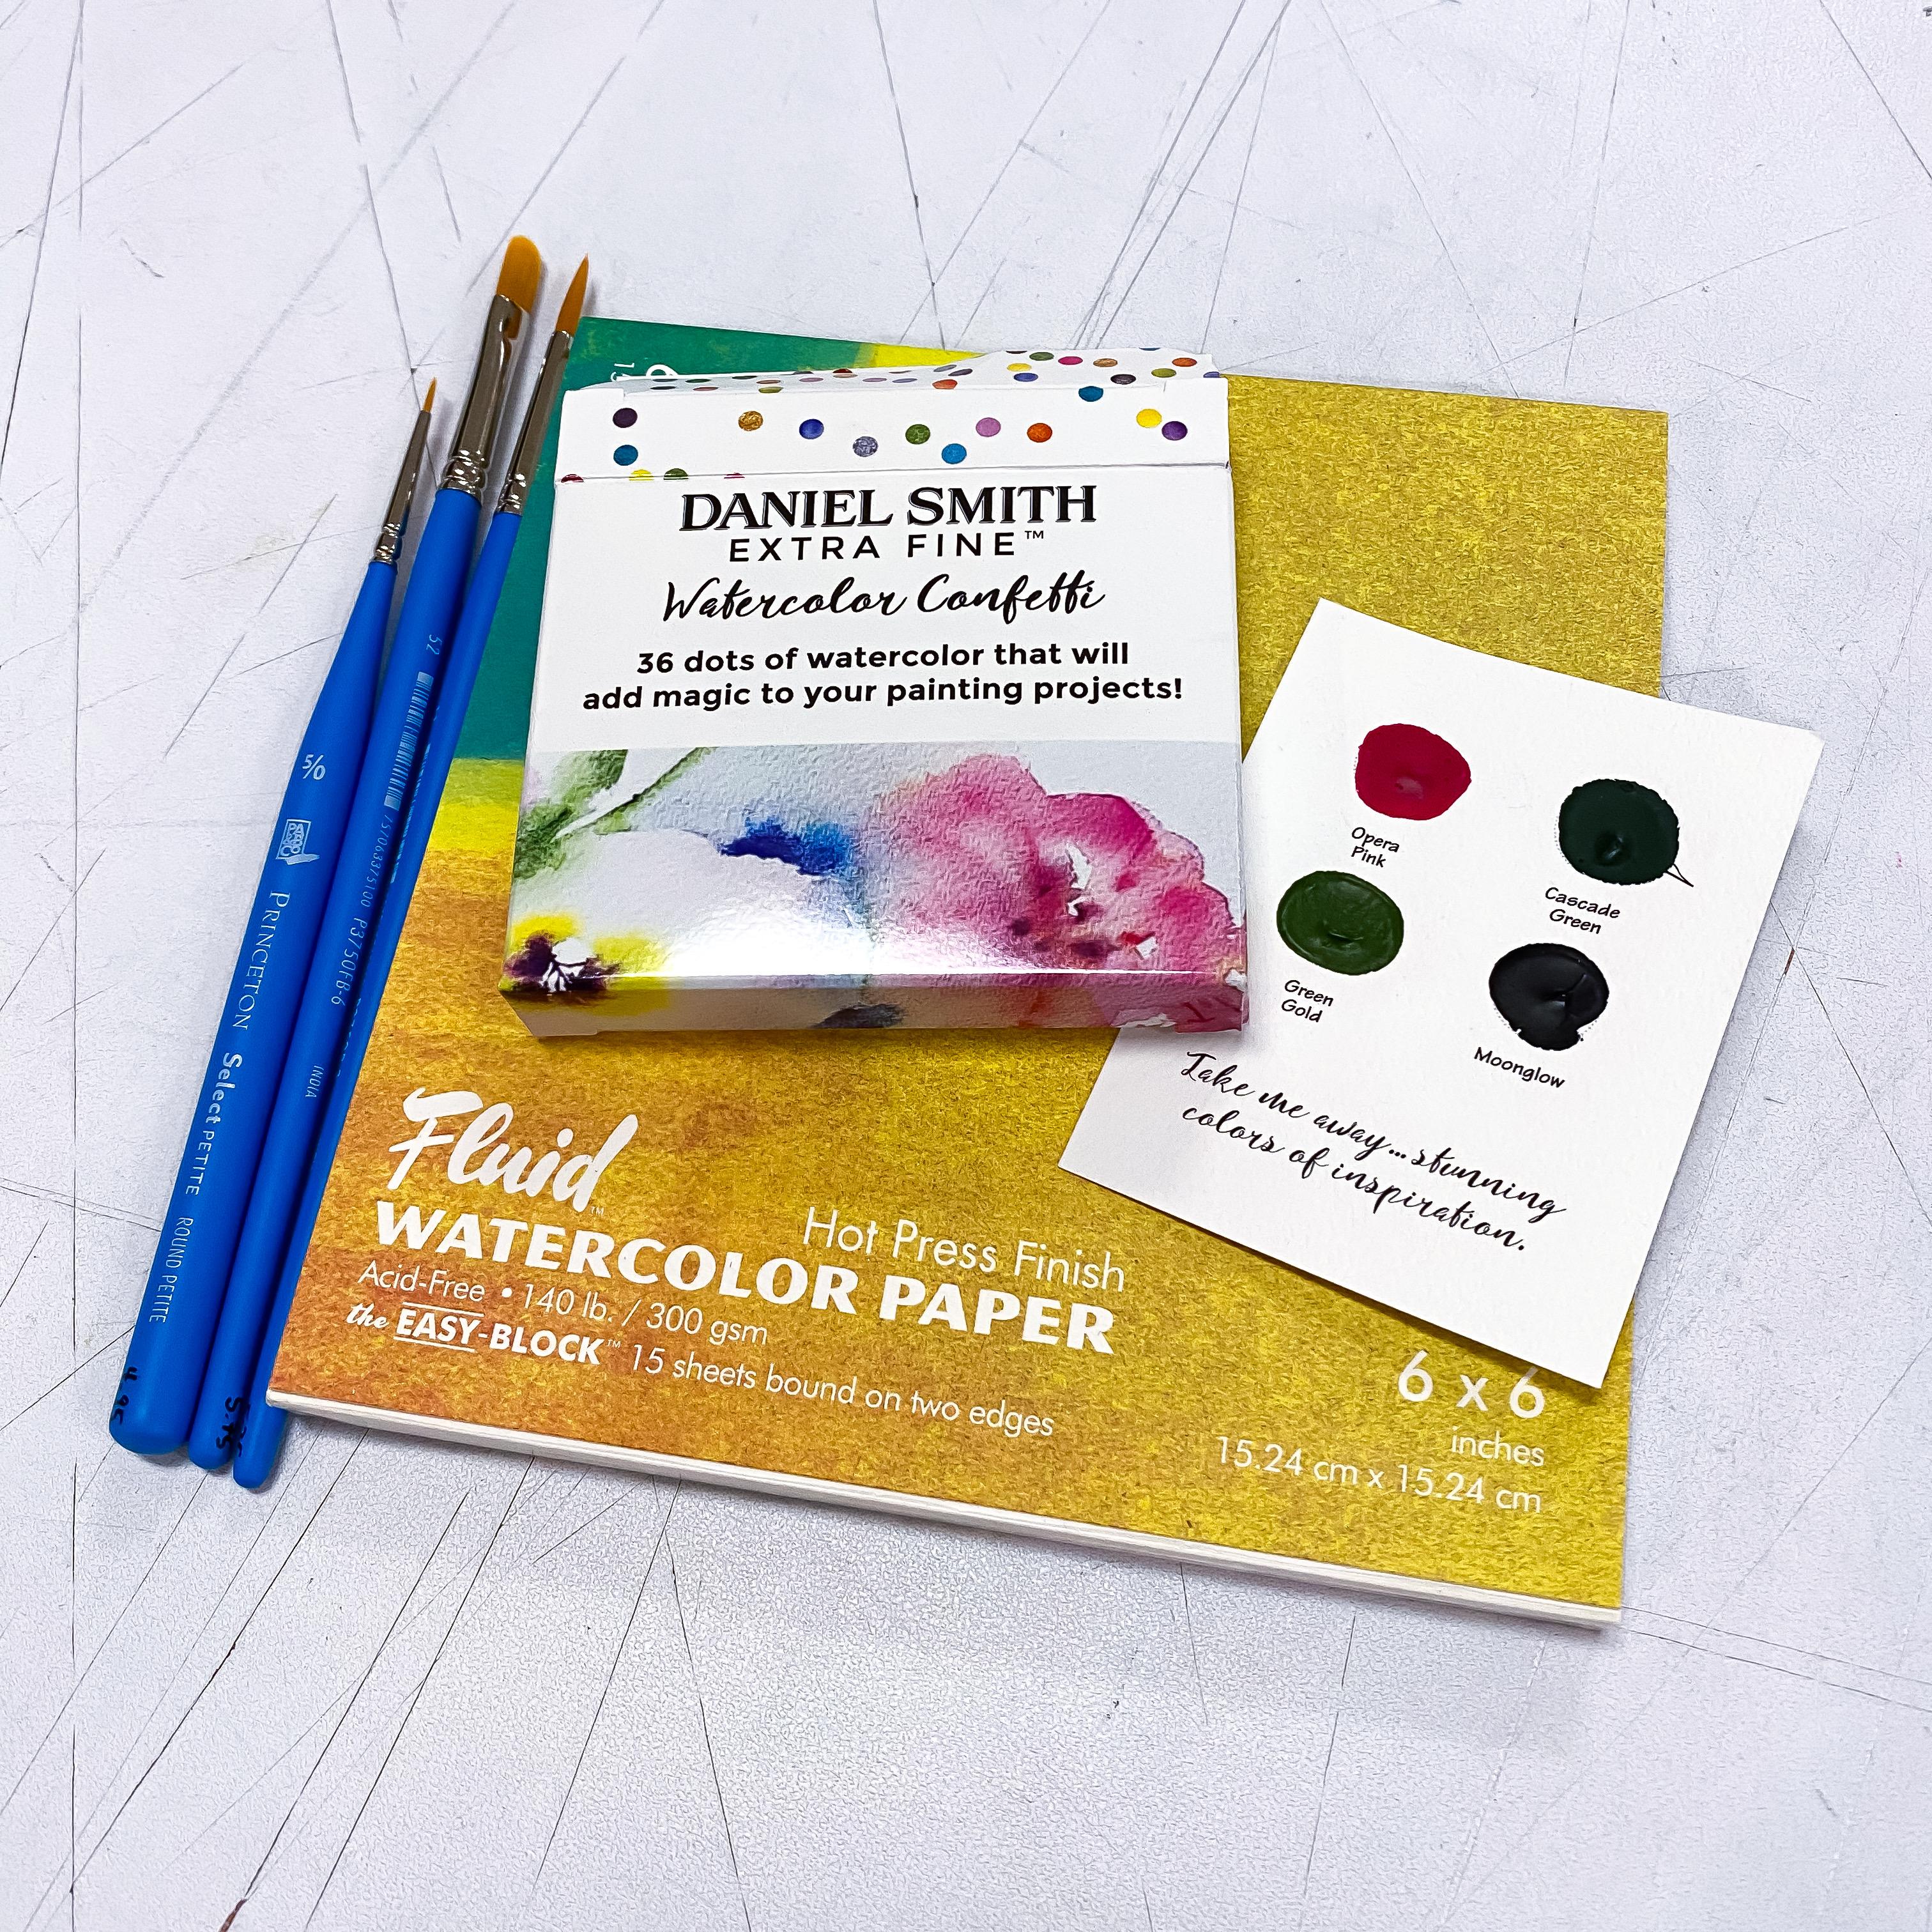 The Little Watercolor Confetti Kit